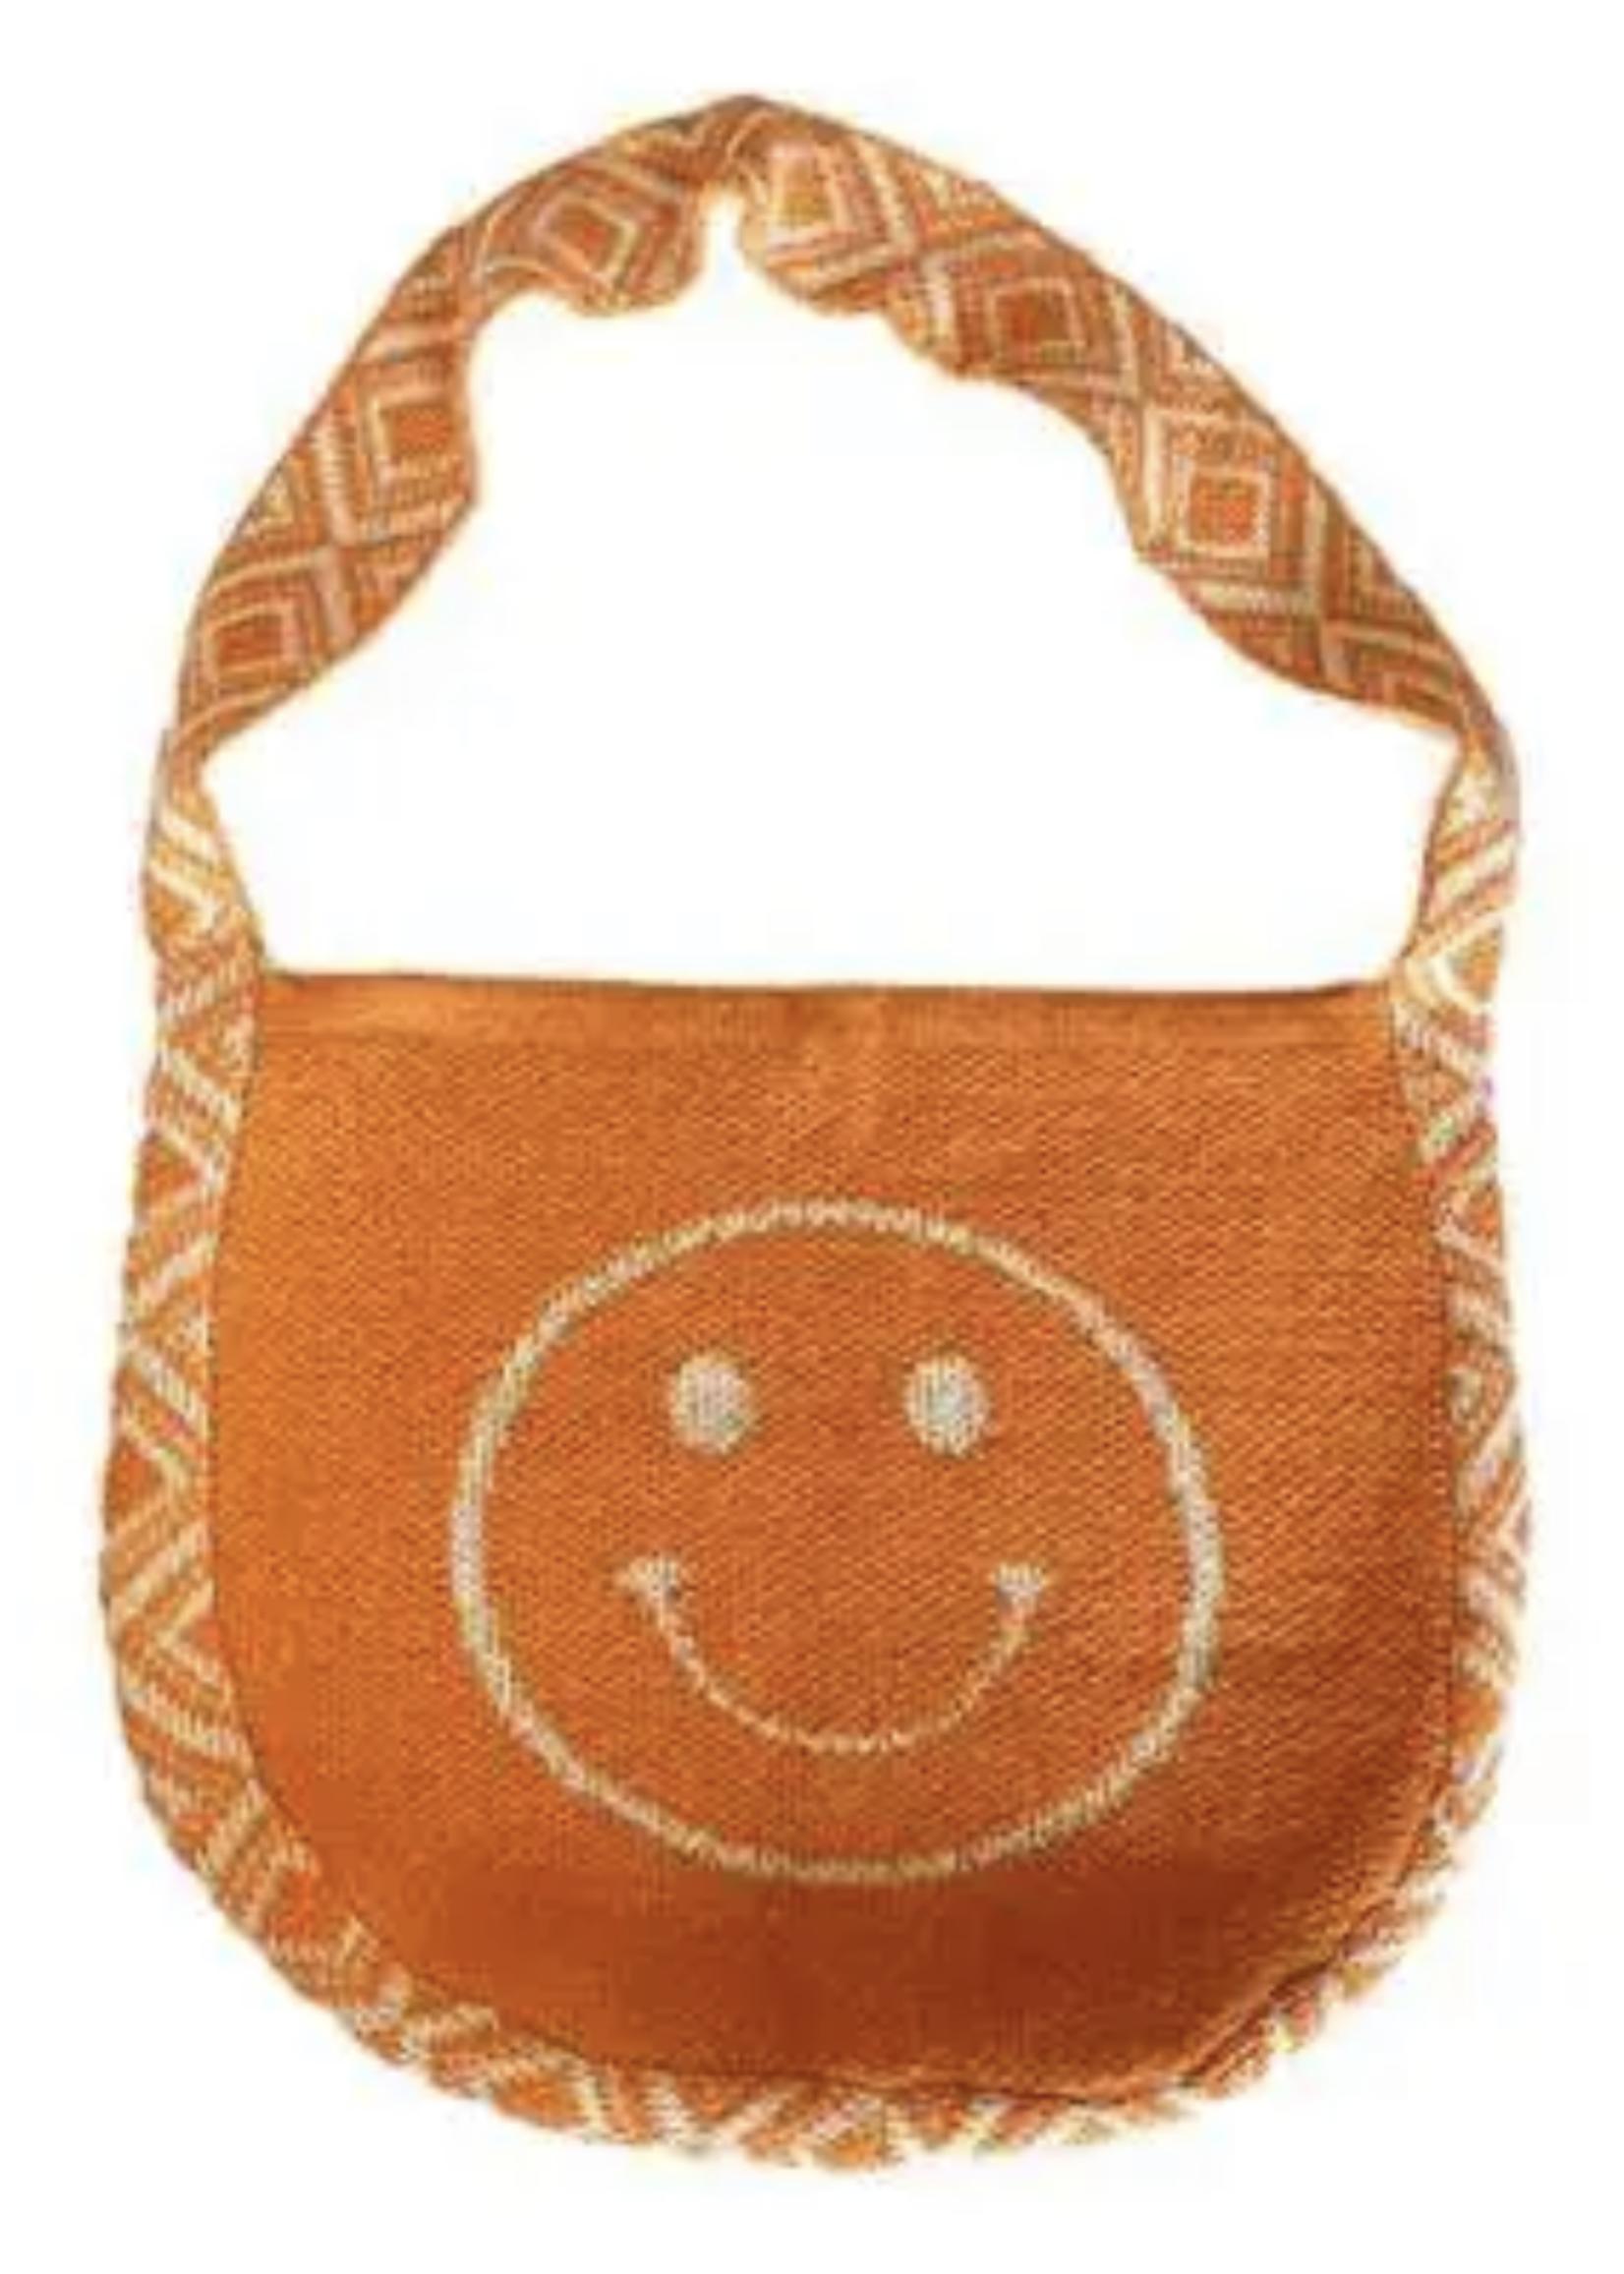 Knit Smiley Face Bag